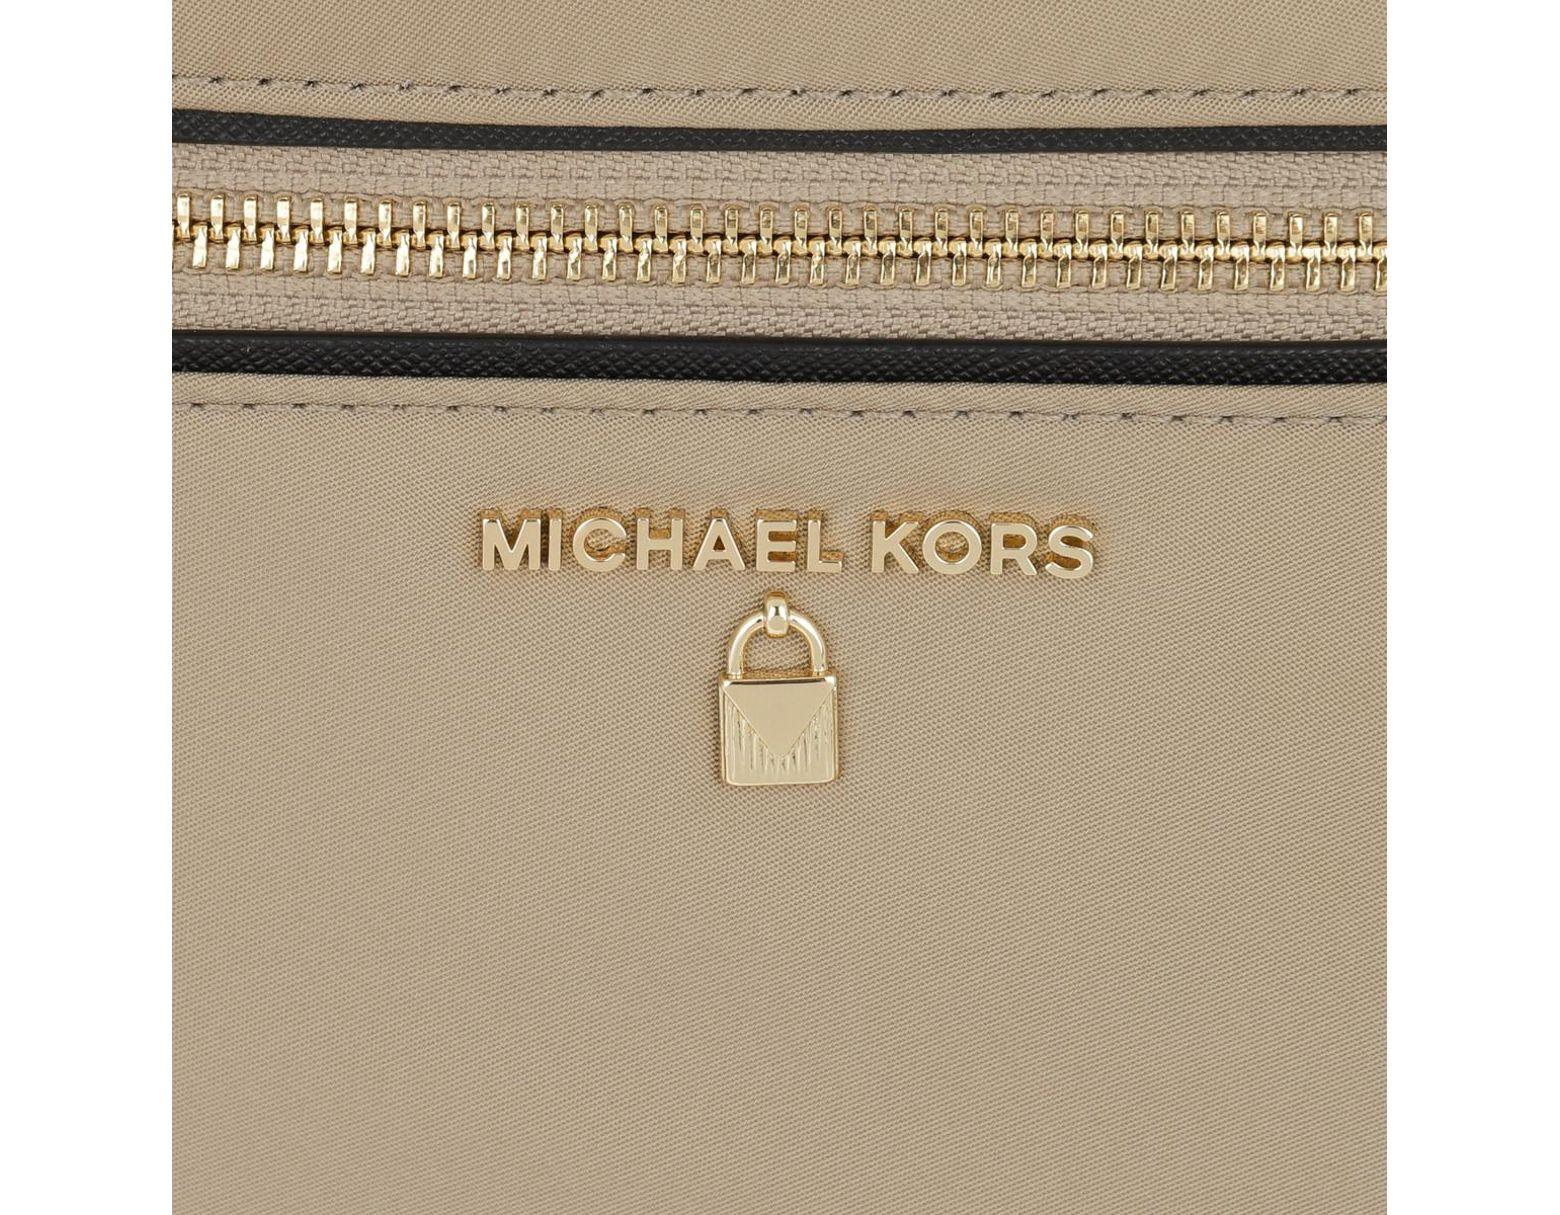 c9e916c53afc Michael Kors Handbags in Natural - Save 33% - Lyst